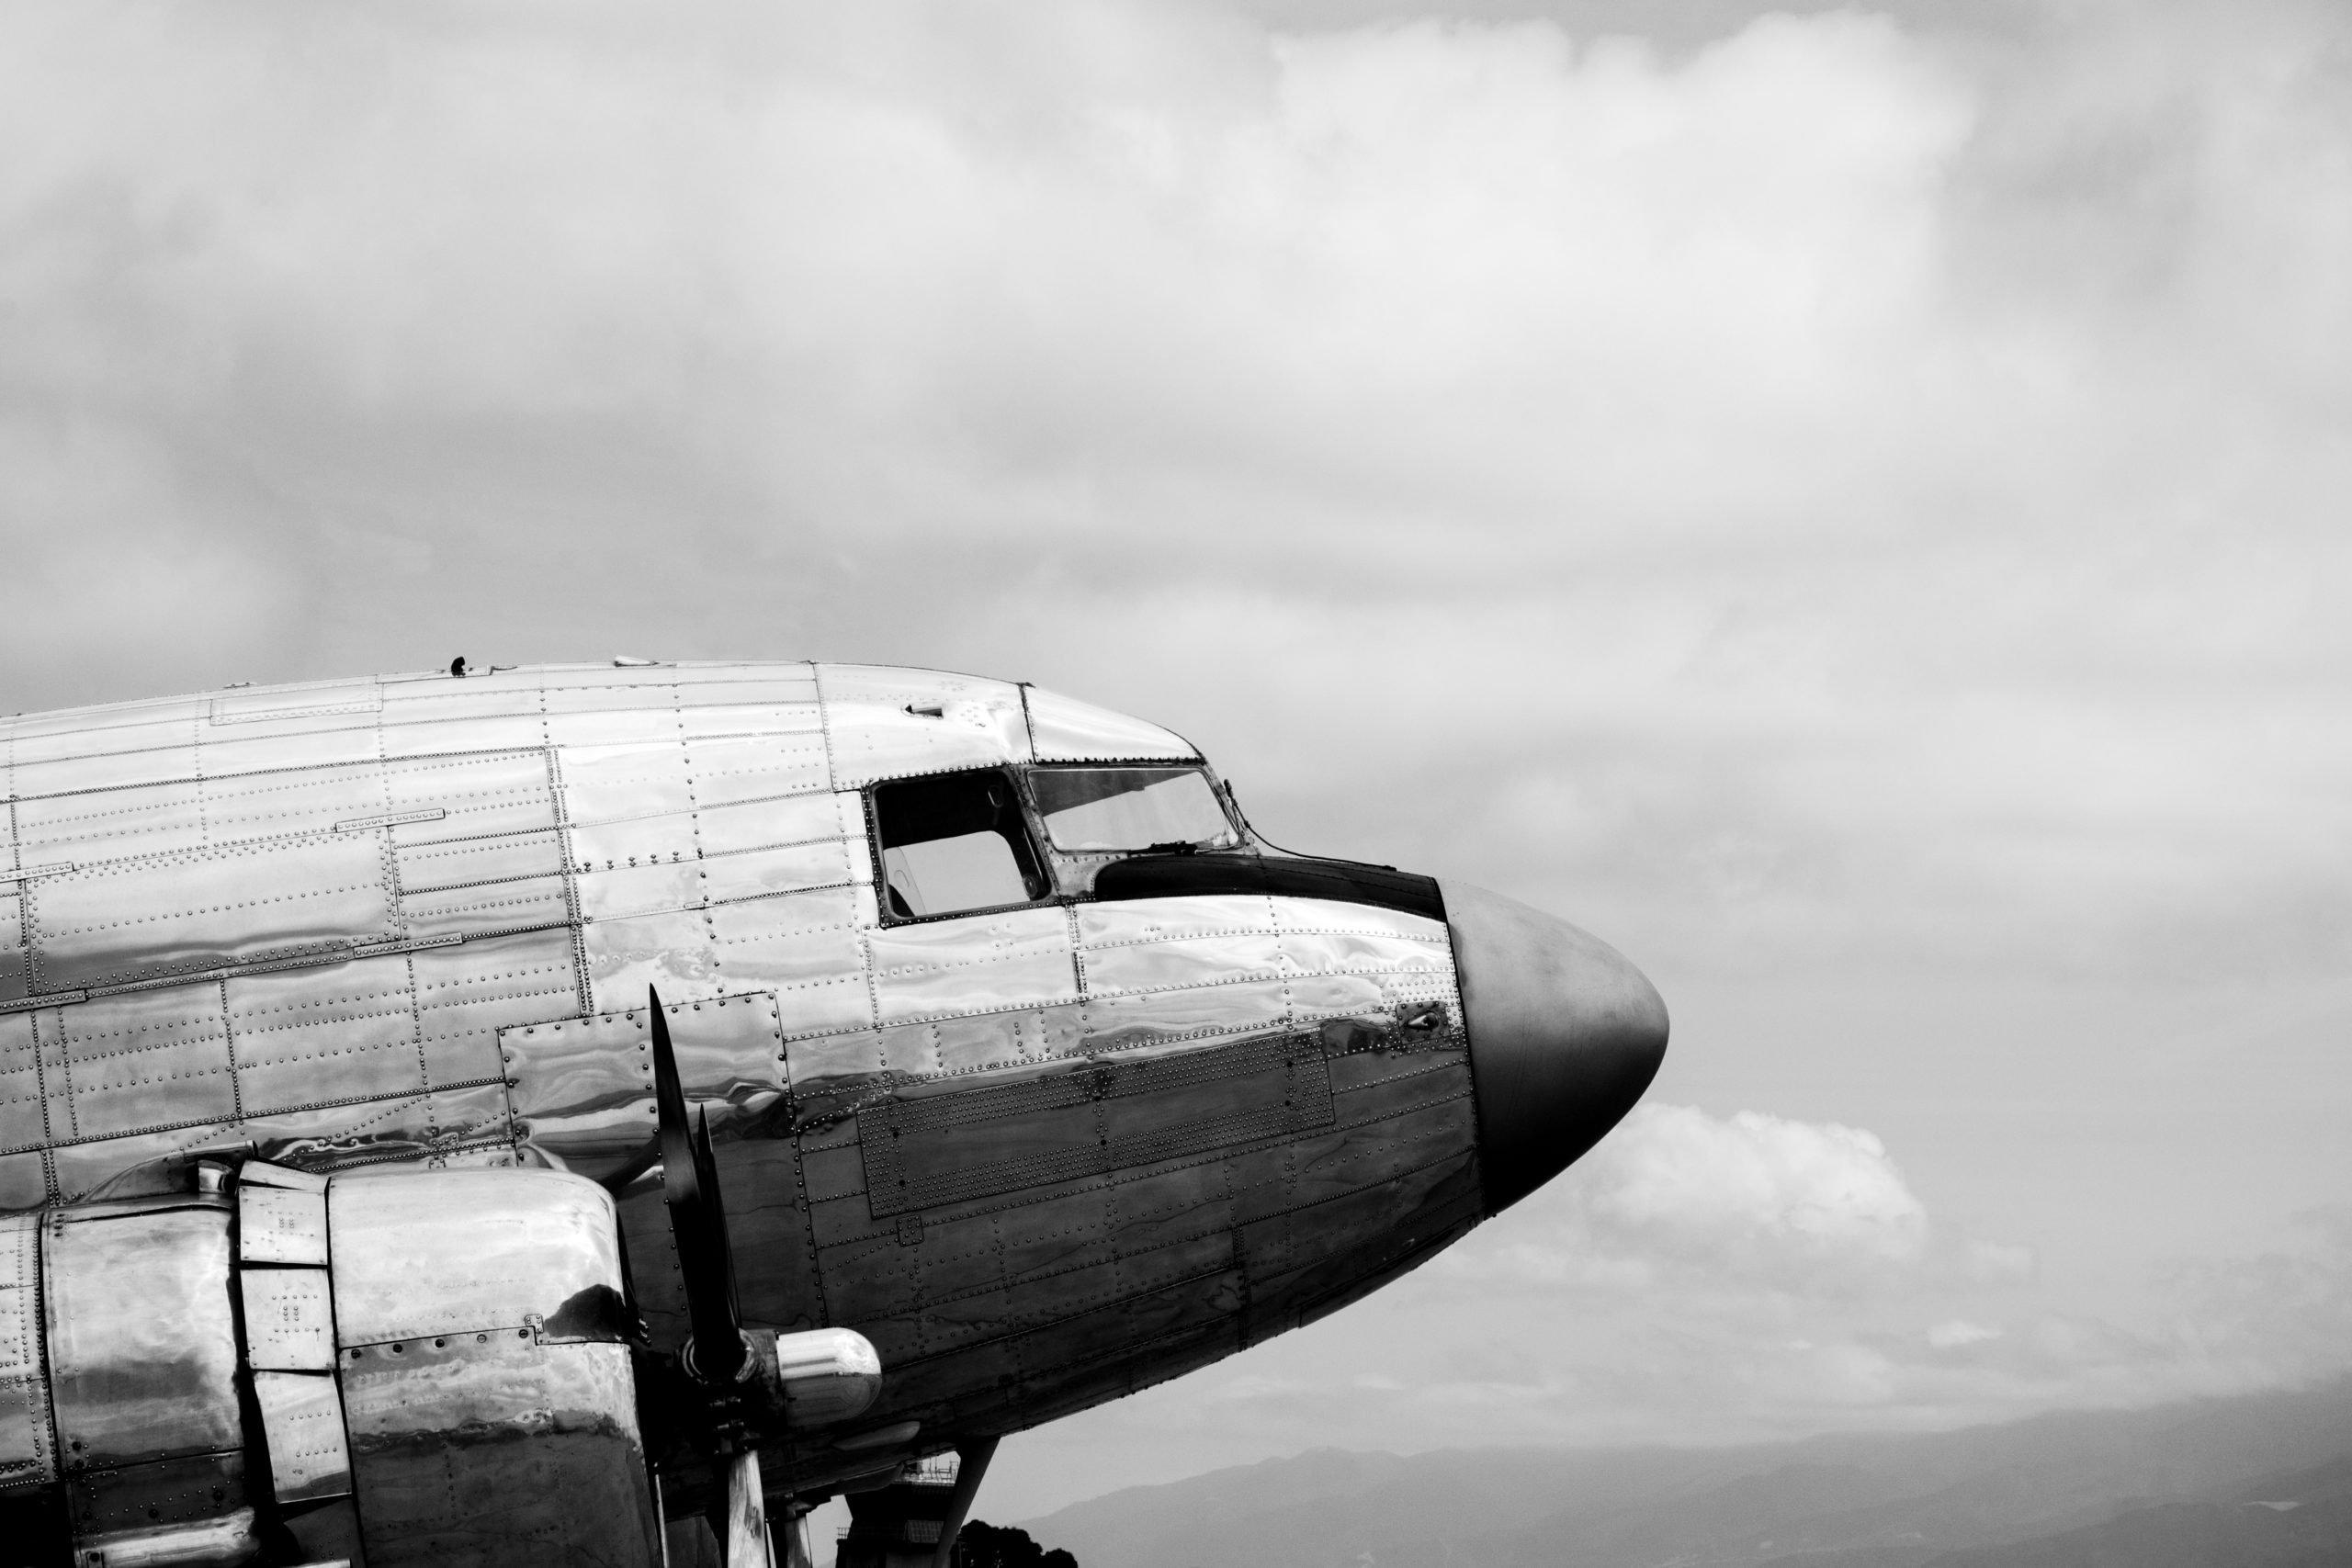 Classic Airliner